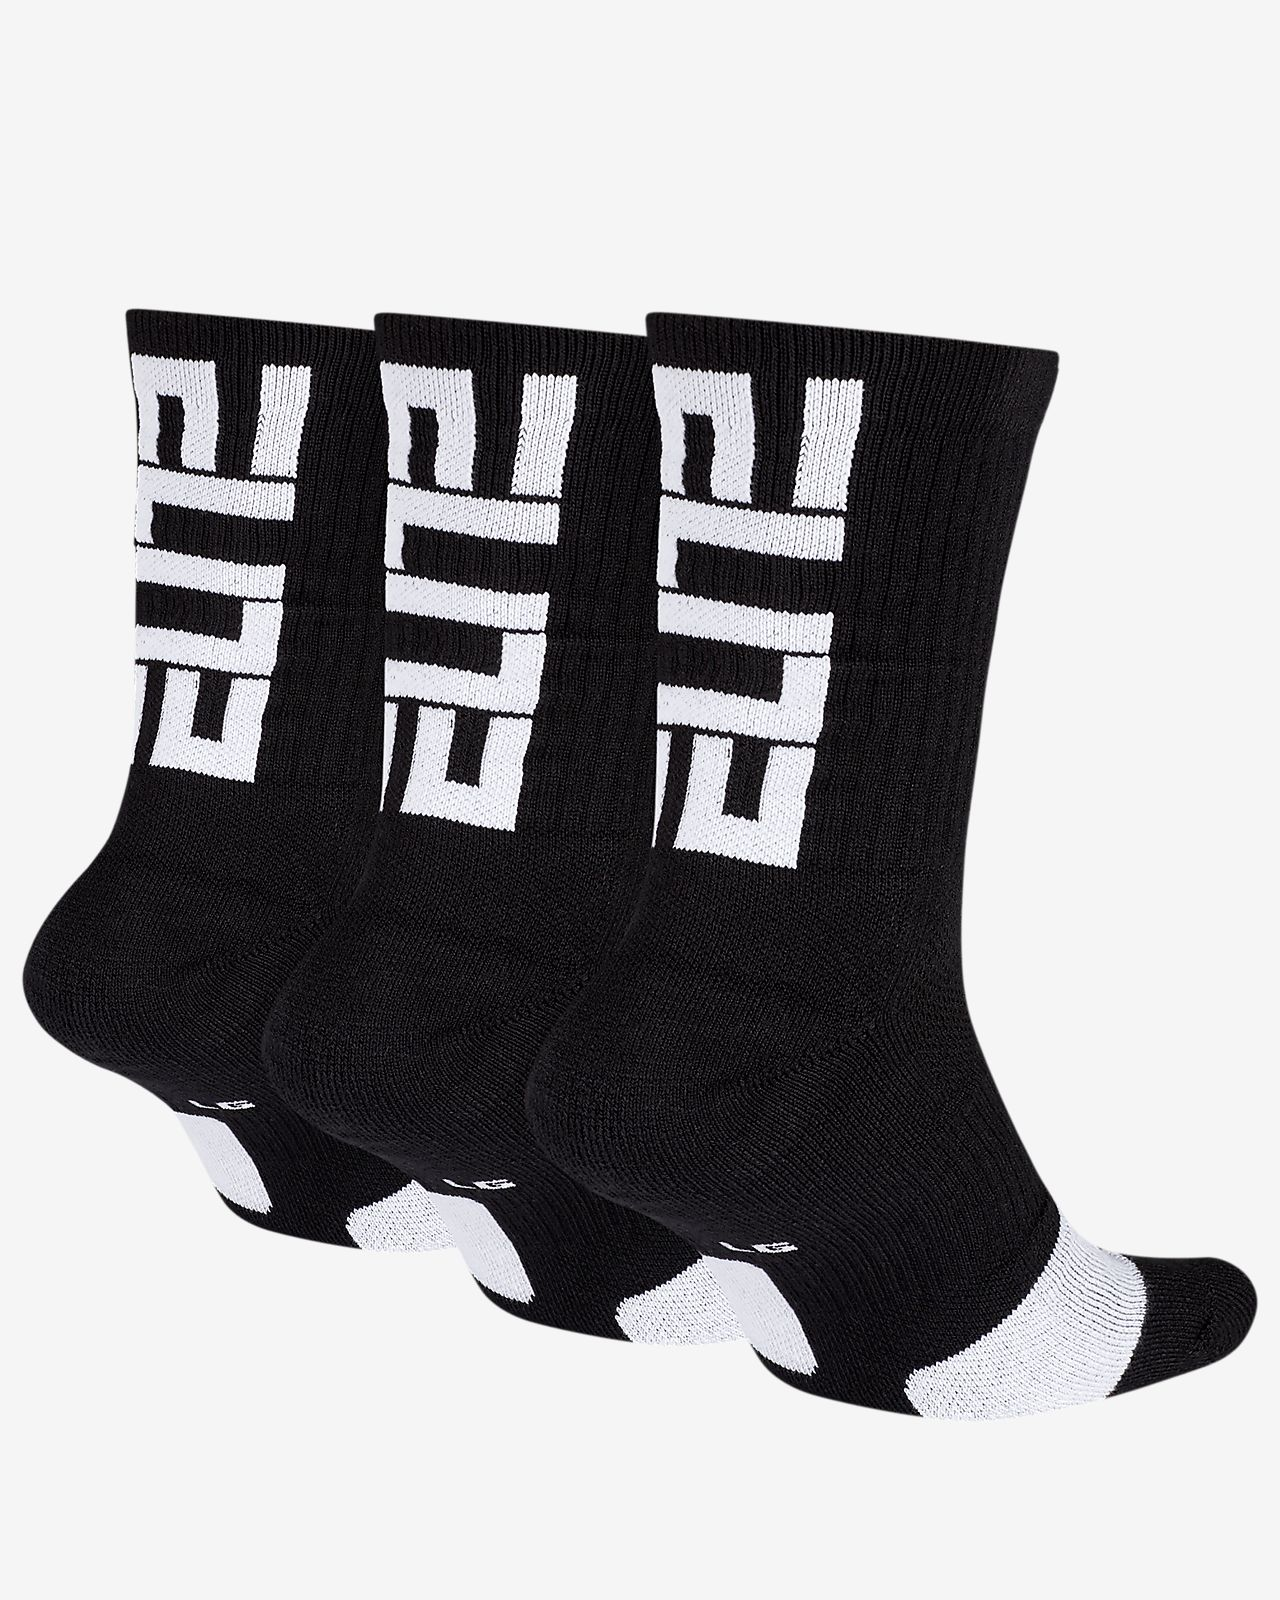 1d01d2bdcf Calze da basket Nike Elite Crew (3 paia). Nike.com IT